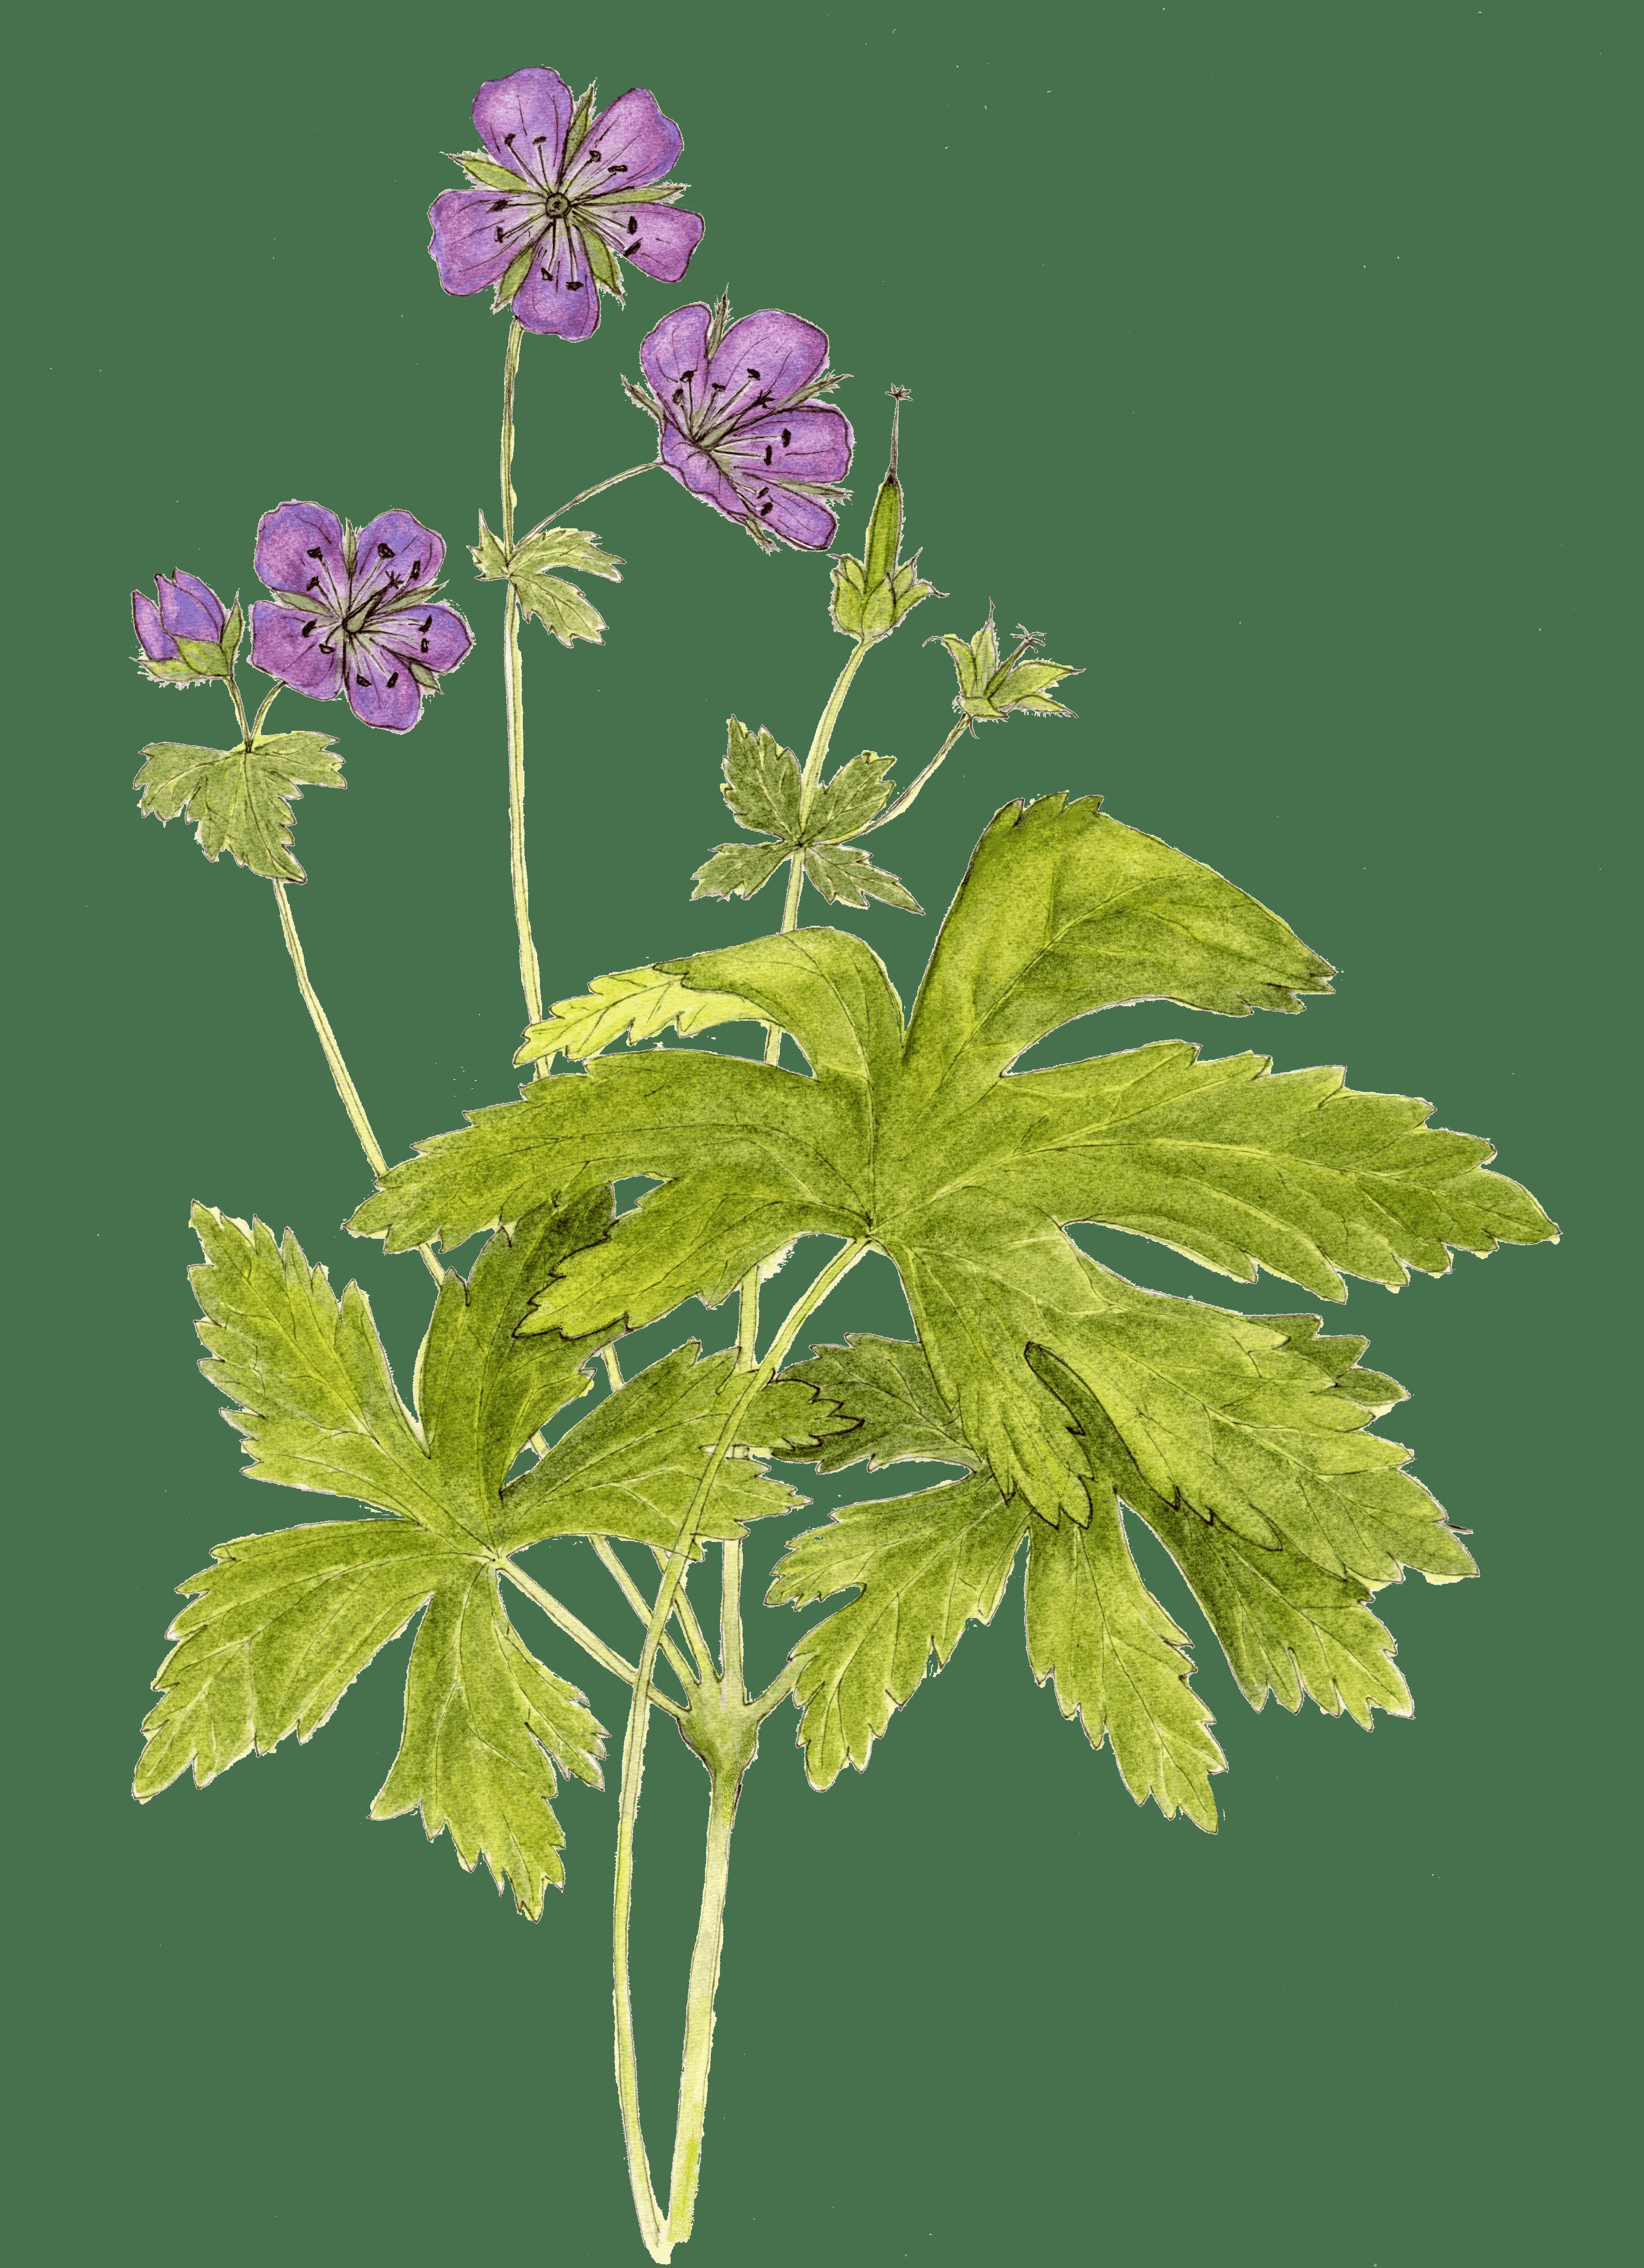 Wildflower Of The Year 2020 Wild Geranium Geranium Maculatum Virginia Native Plant Society